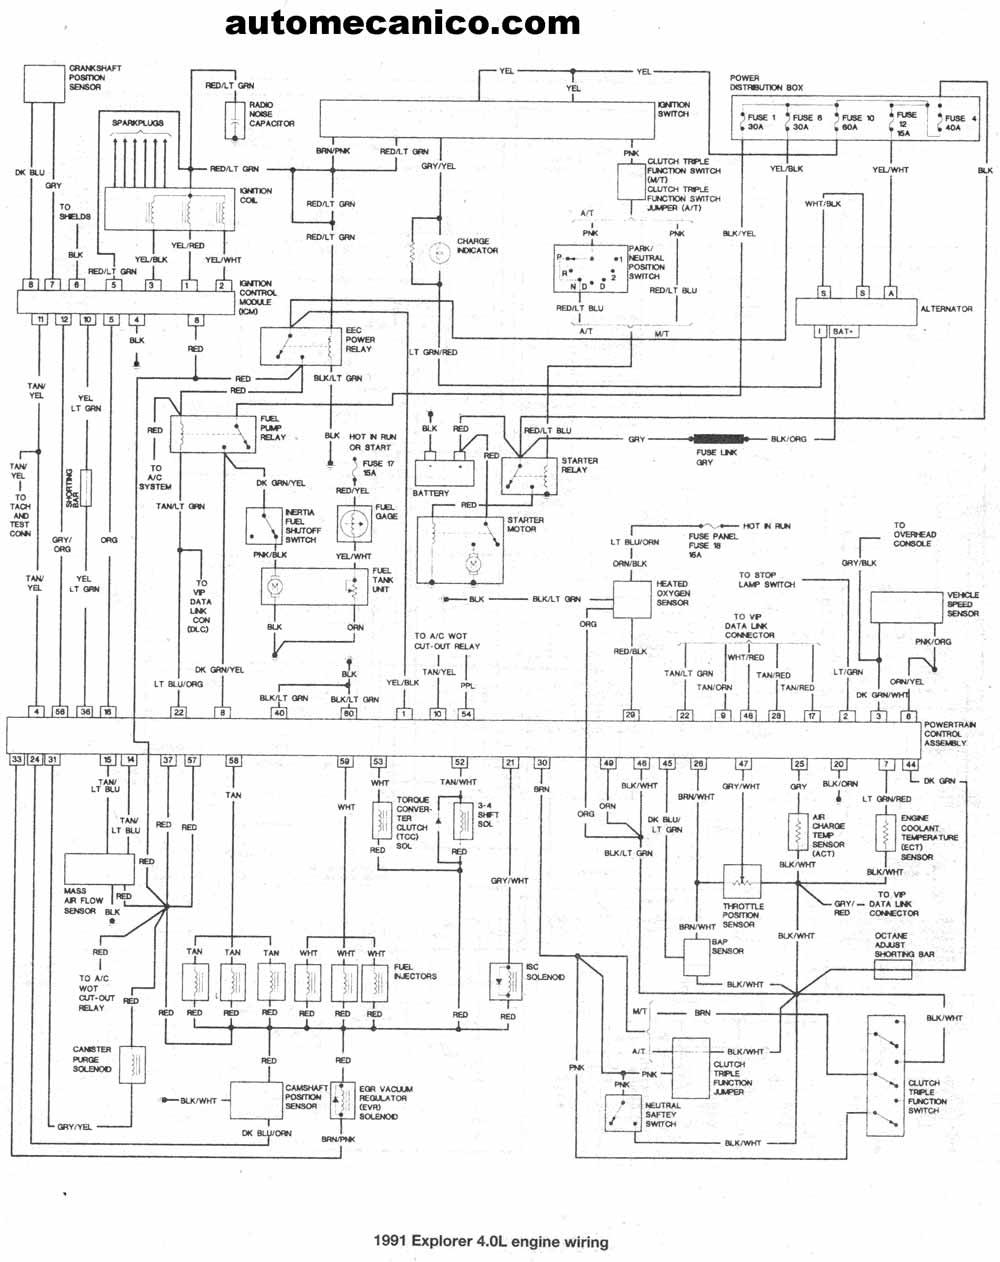 135 Sensor De Posicion Del Cigueenal Ckp likewise Diagrama De Fusibles 2000 Ford Explorer furthermore Discussion T20021 ds587395 additionally T11602866 Manual de fusibles ford contour furthermore Manual De Ford Explorer 91 T1430772. on diagrama de fusibles ford explorer 1998